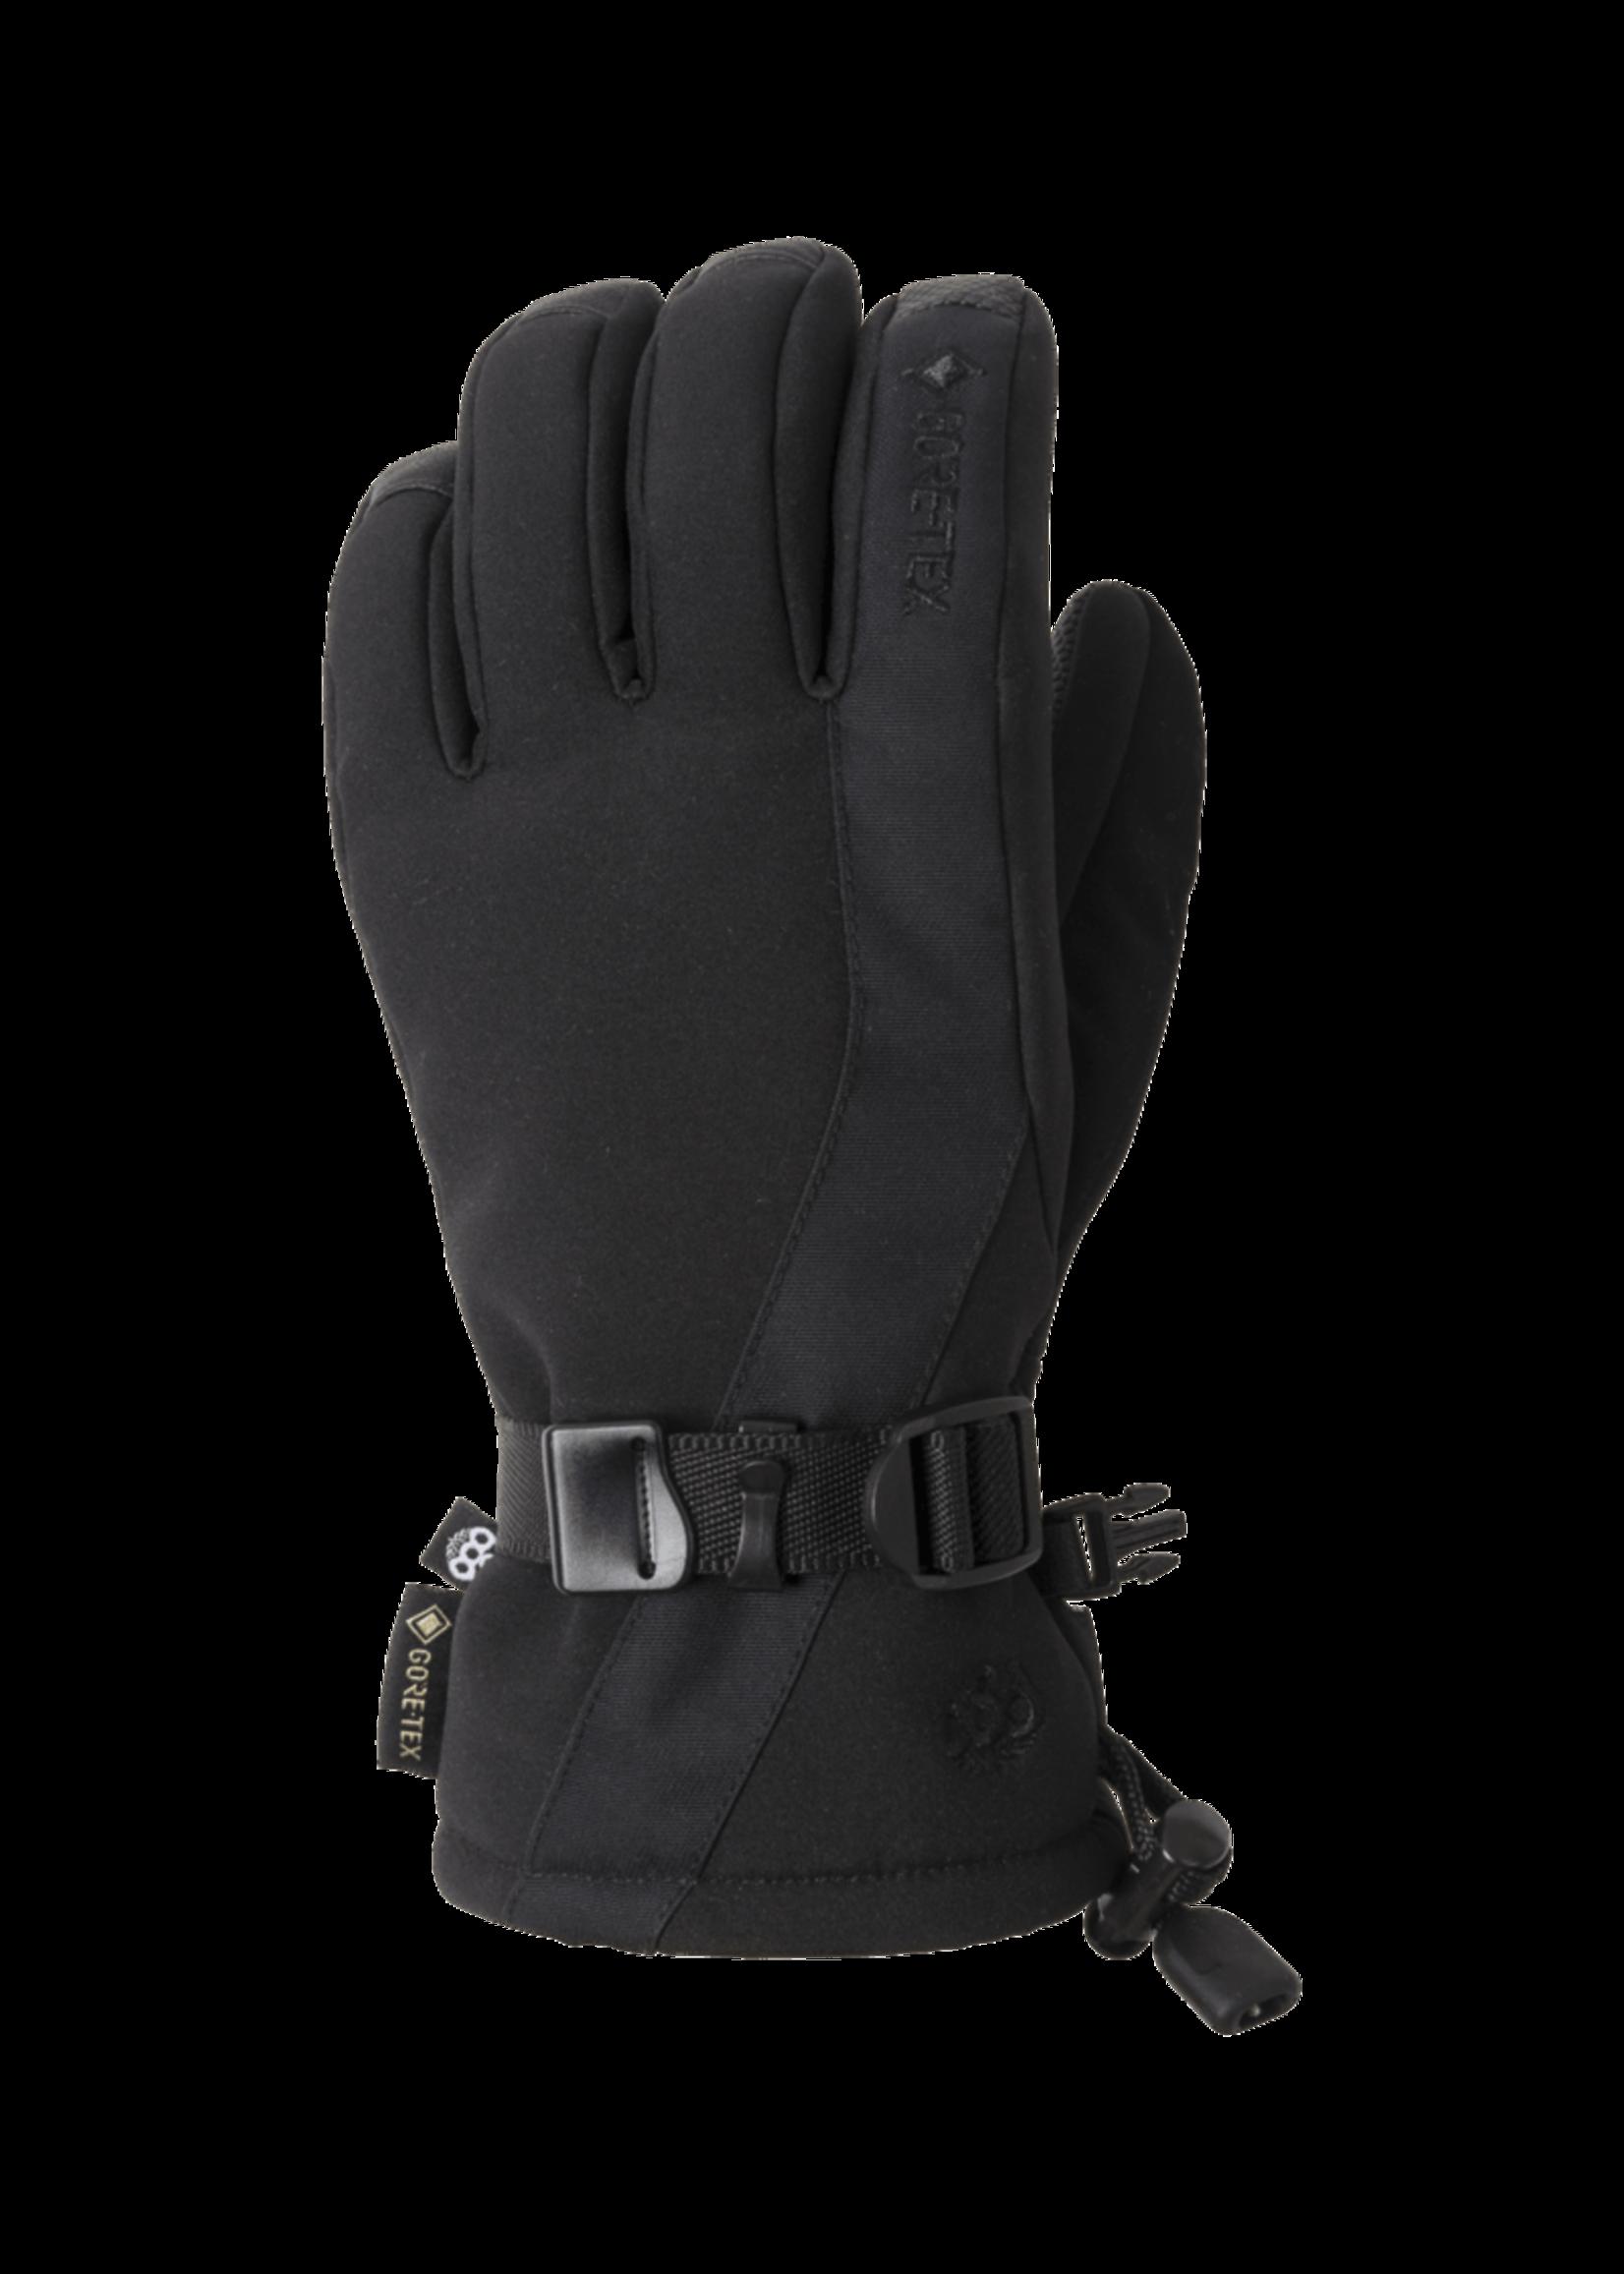 686 686 Womens Linear Glove